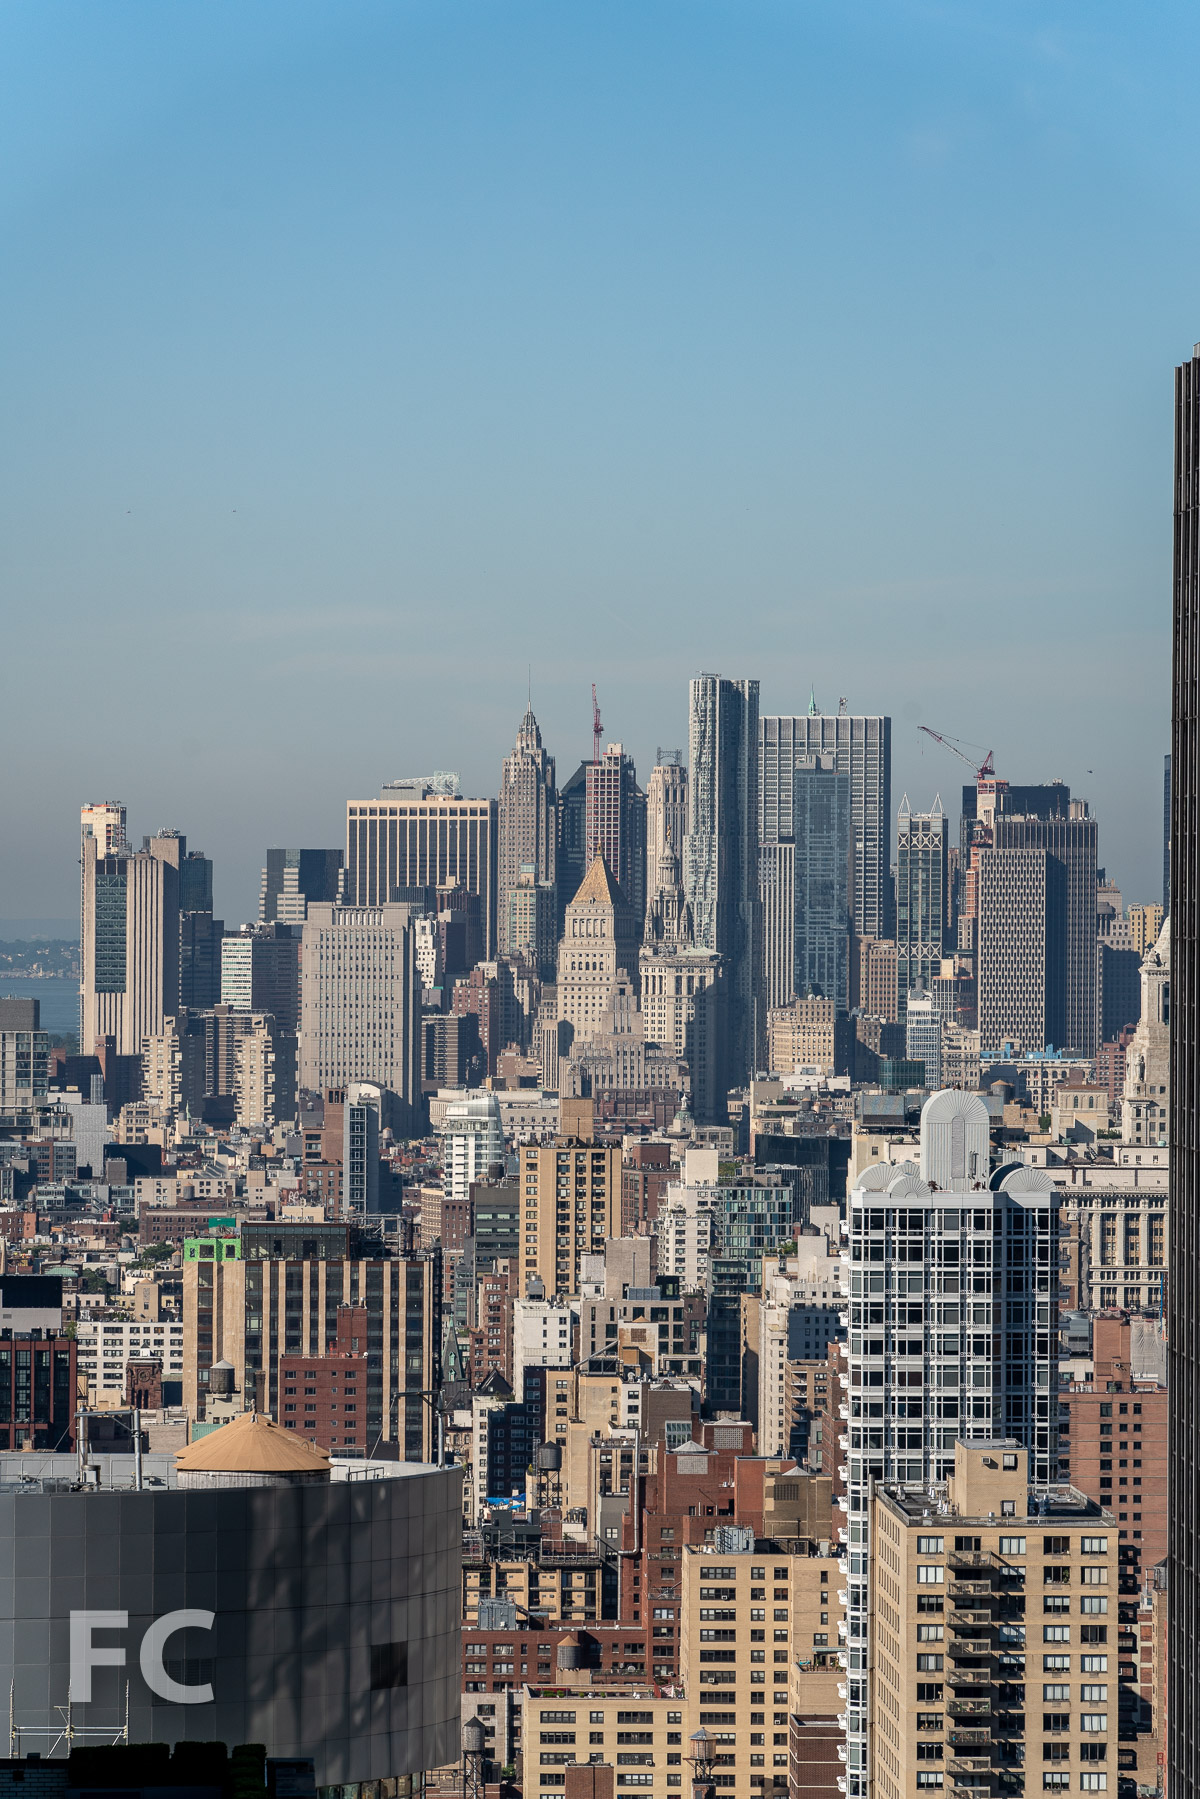 View south towards Lower Manhattan.